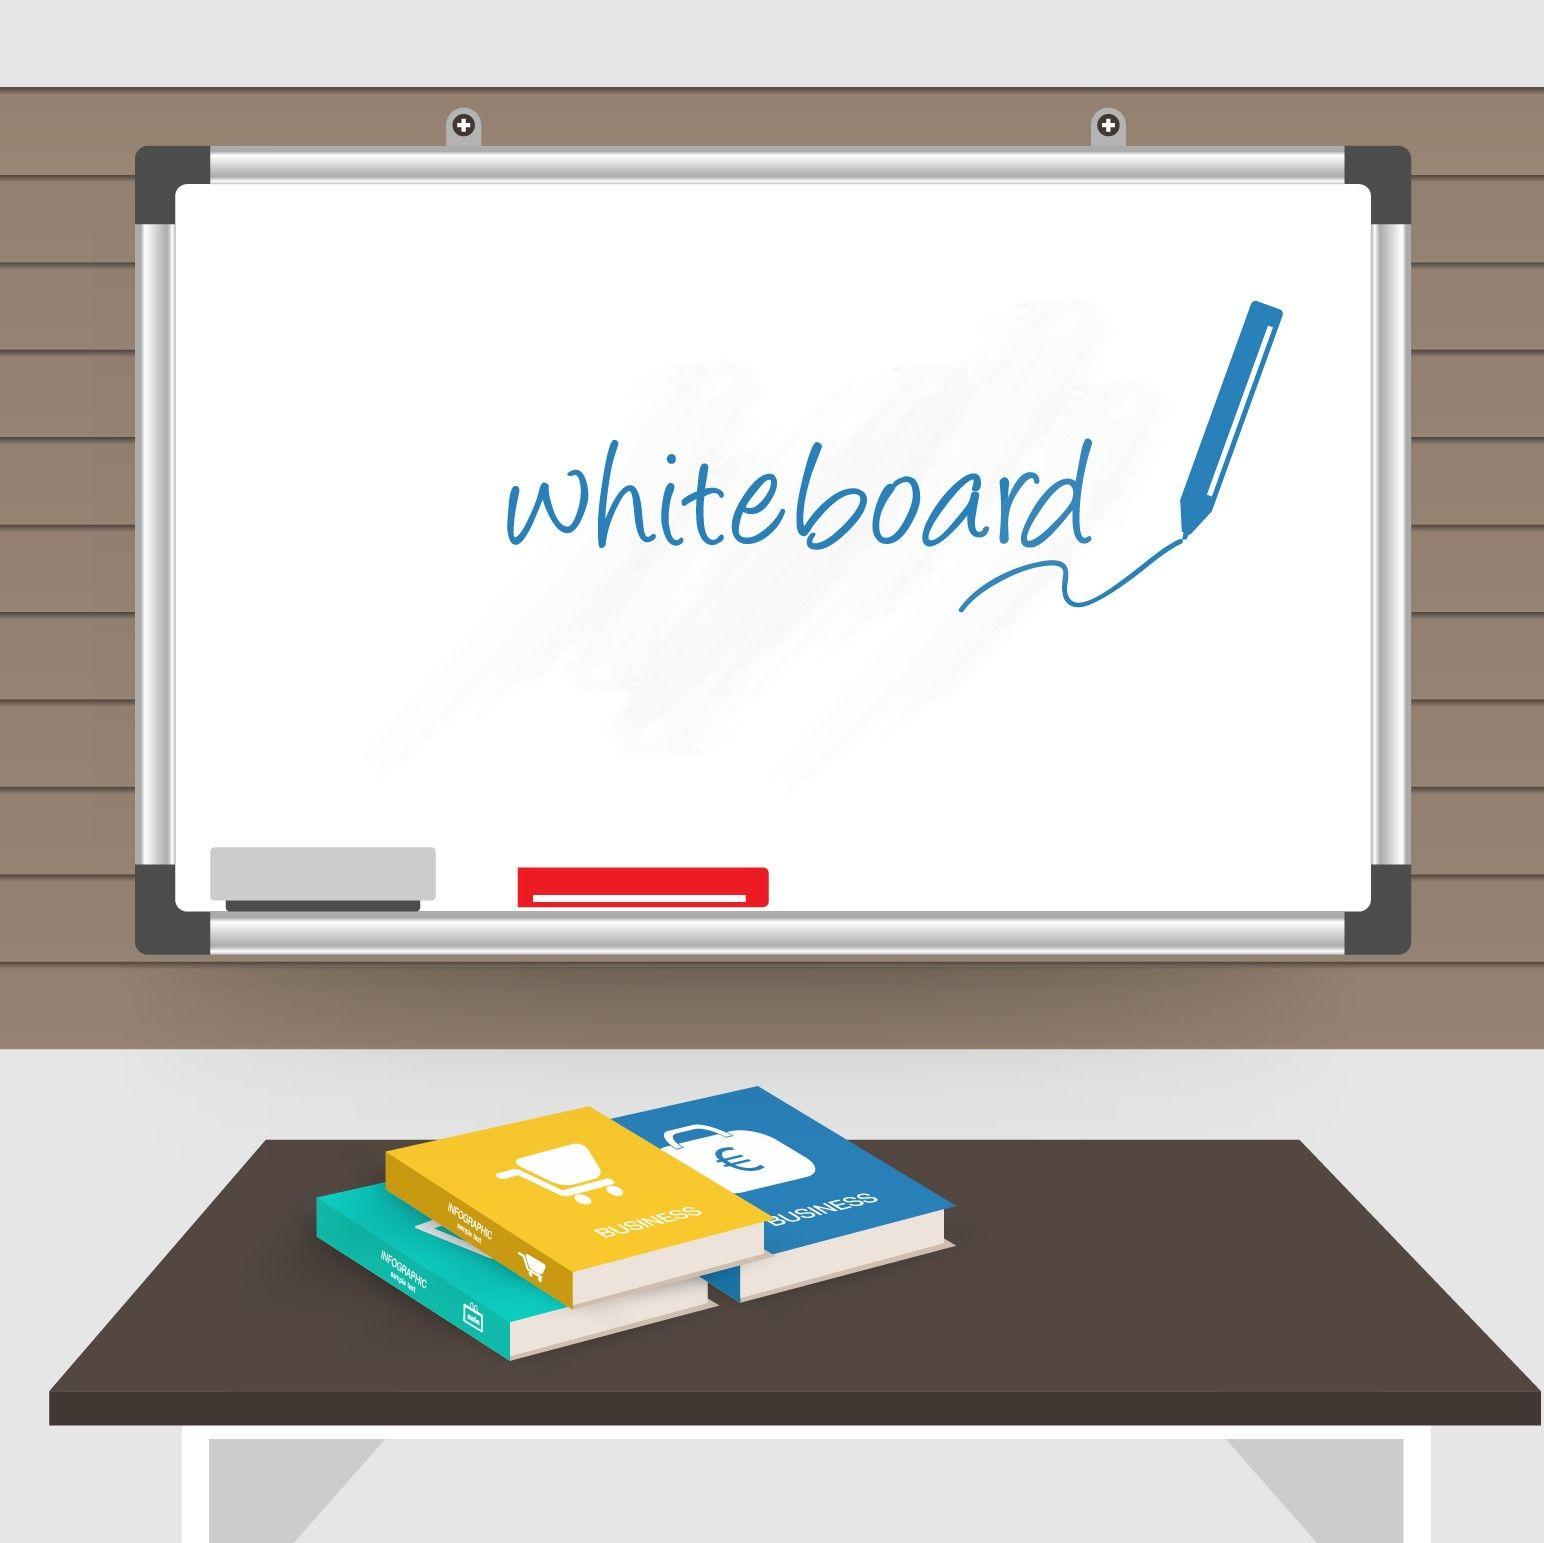 Whiteboard Animation White Board Dry Erase Whiteboard Wipe Board